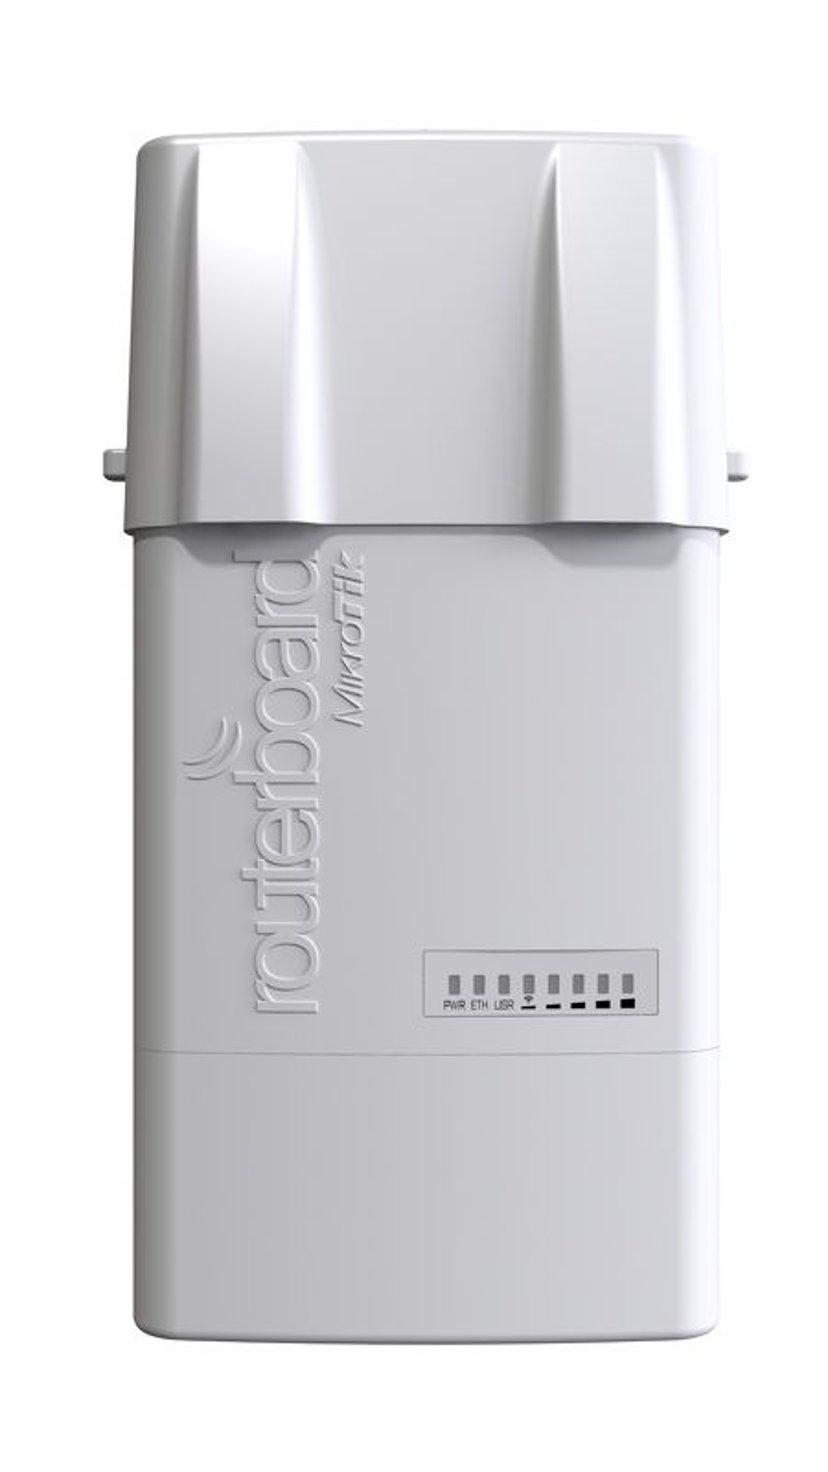 Mikrotik Netbox 5 Wireless Access Point 802.11AC Rp-Sma